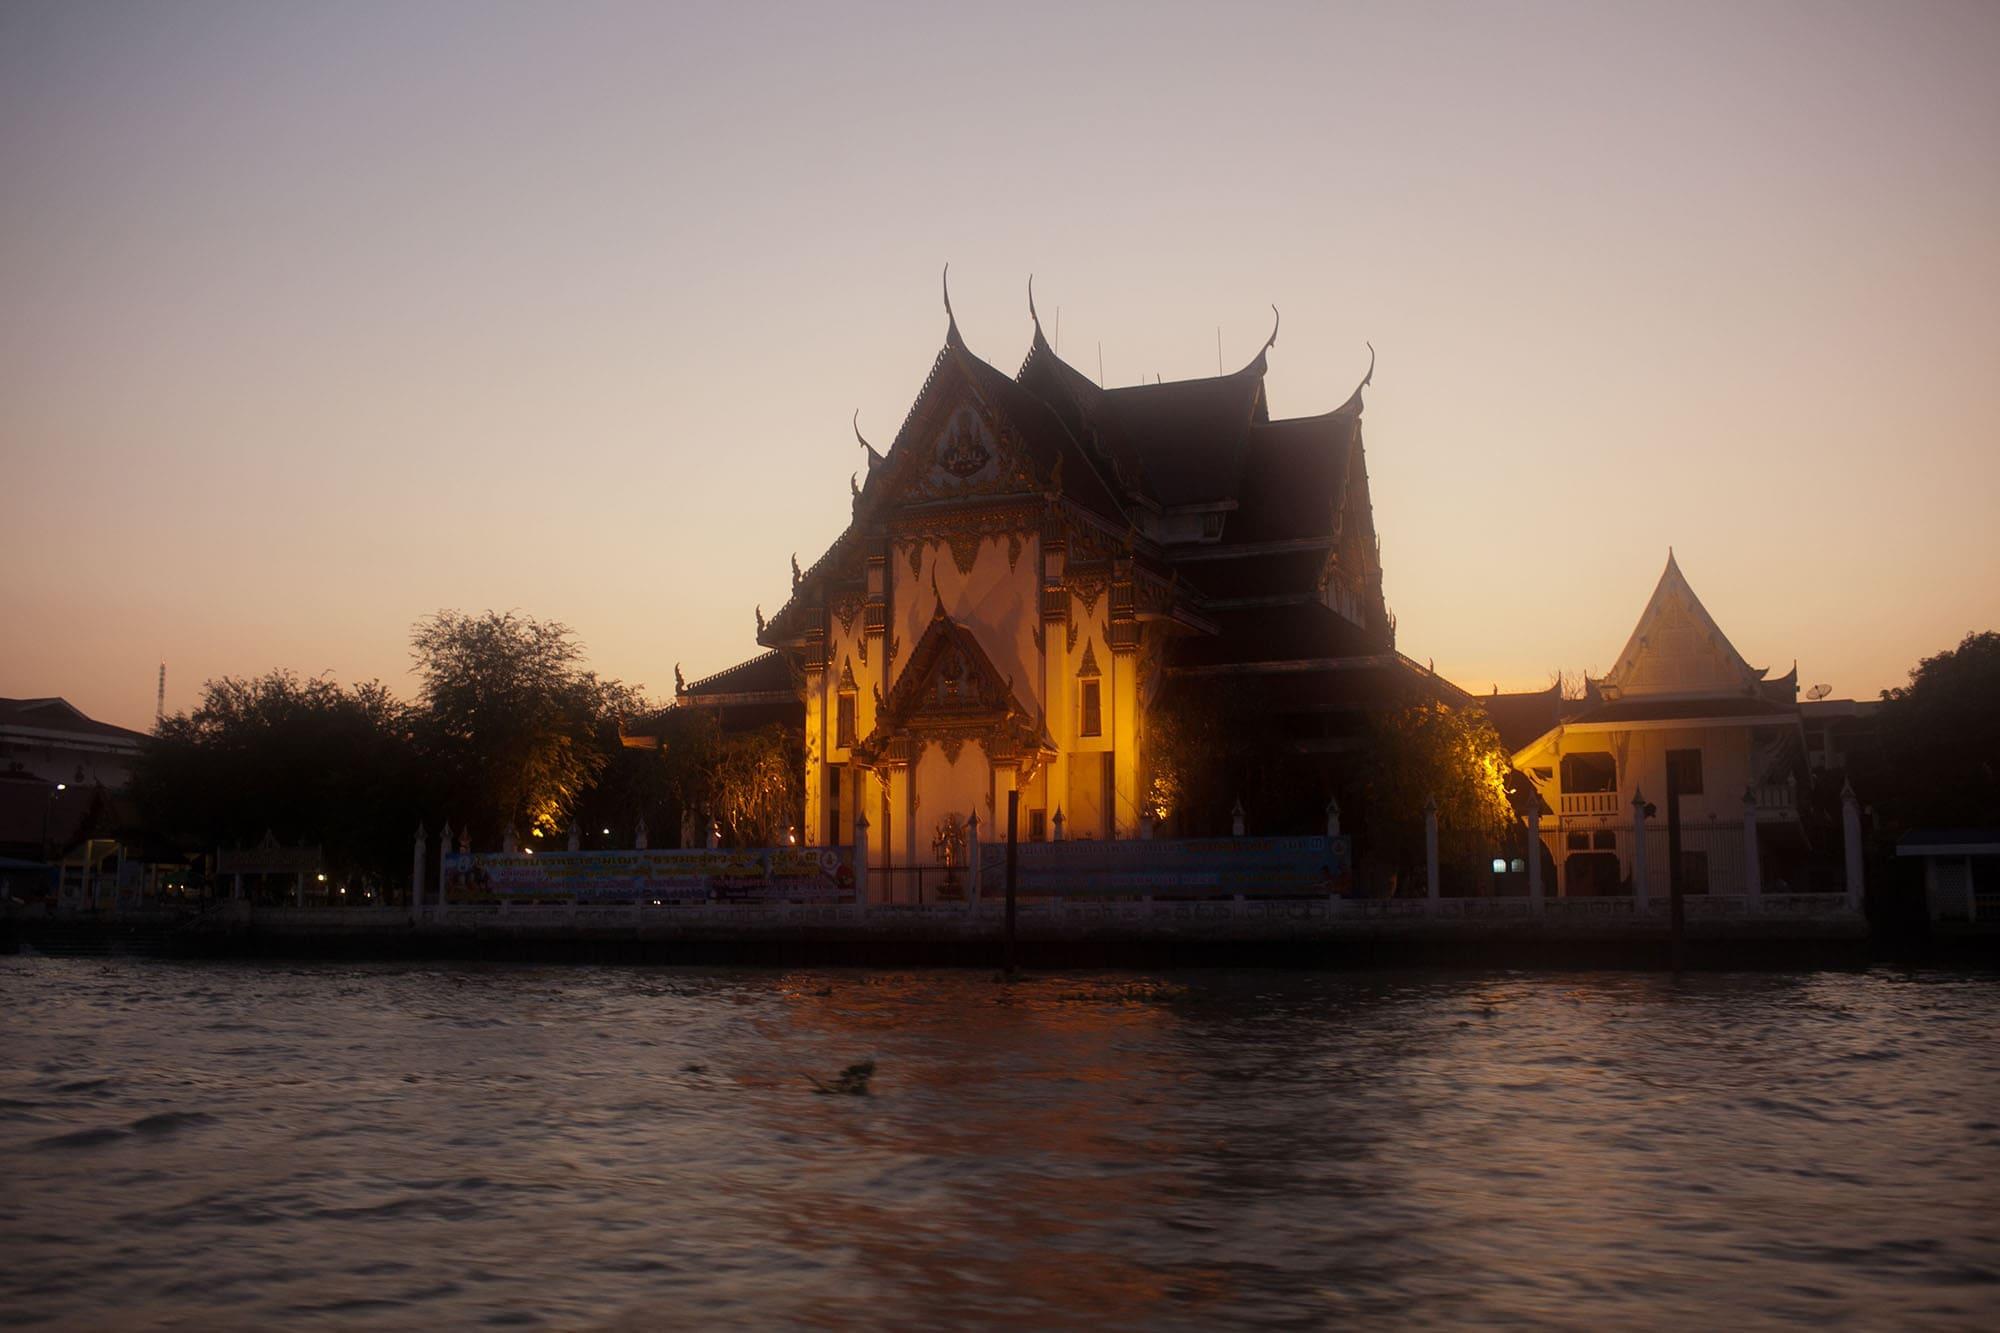 Boat ride down the river in Bangkok, Thailand